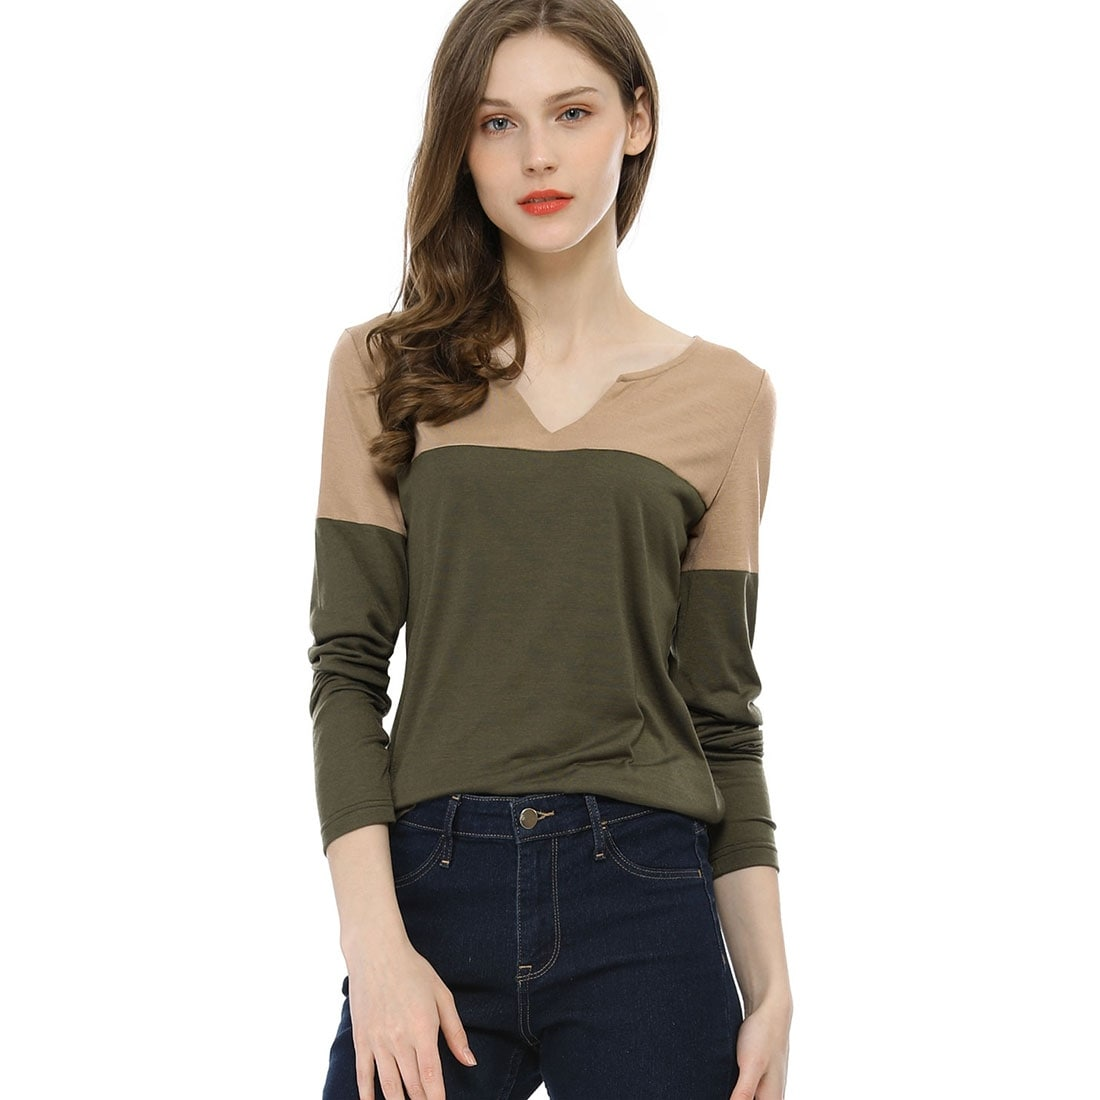 9bdec6c8d45 Shop Unique Bargains Women Split V-neck Long Sleeves Color Block T-Shirt -  Free Shipping On Orders Over $45 - Overstock - 28267345